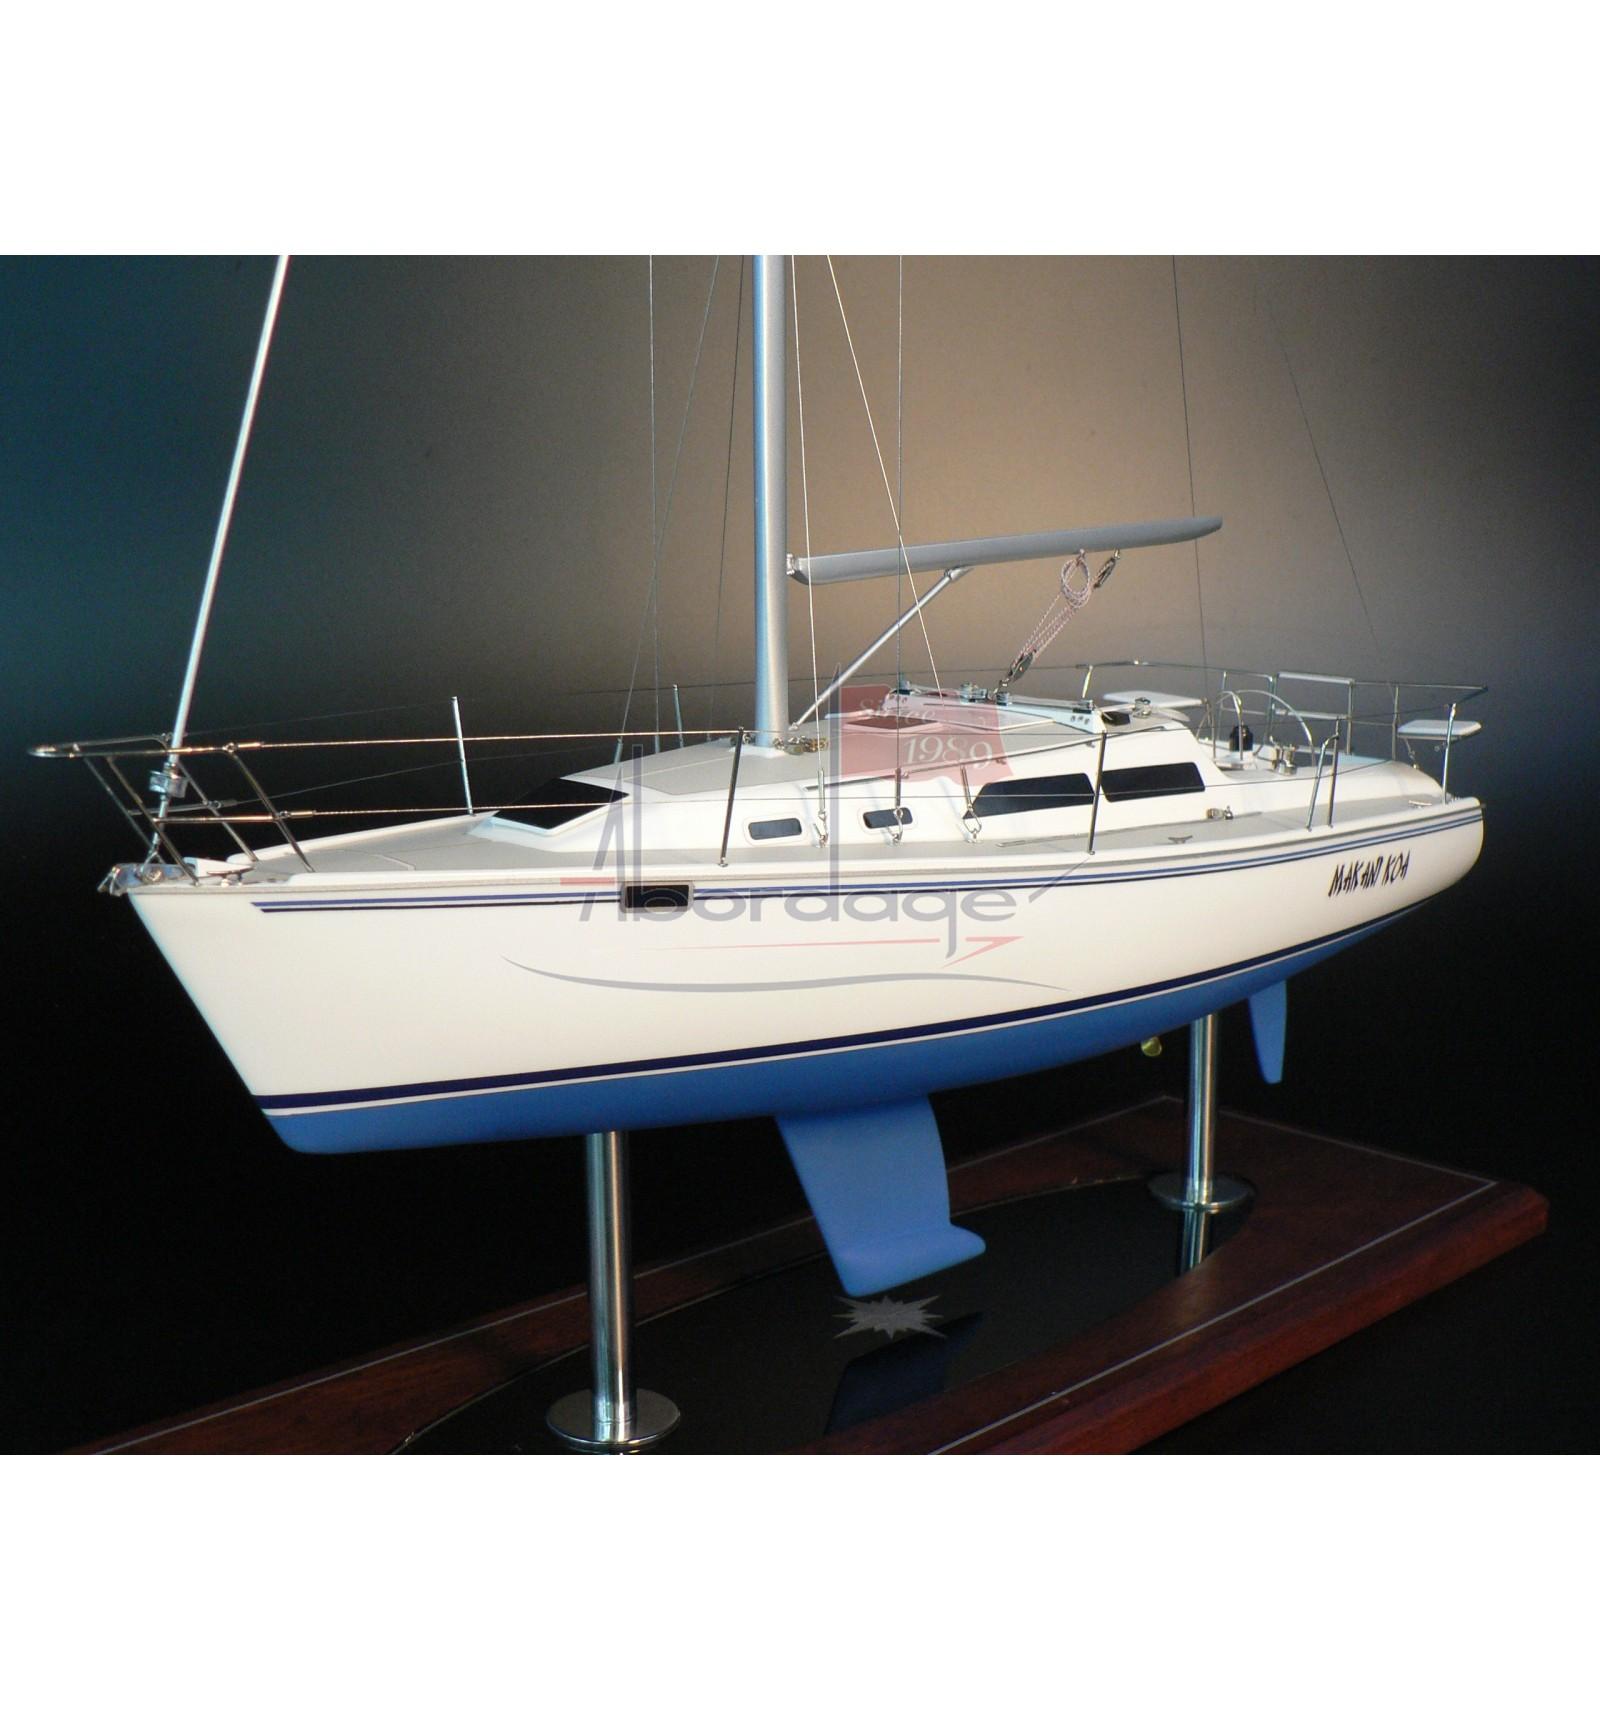 Catalina 320 model built by Abordage